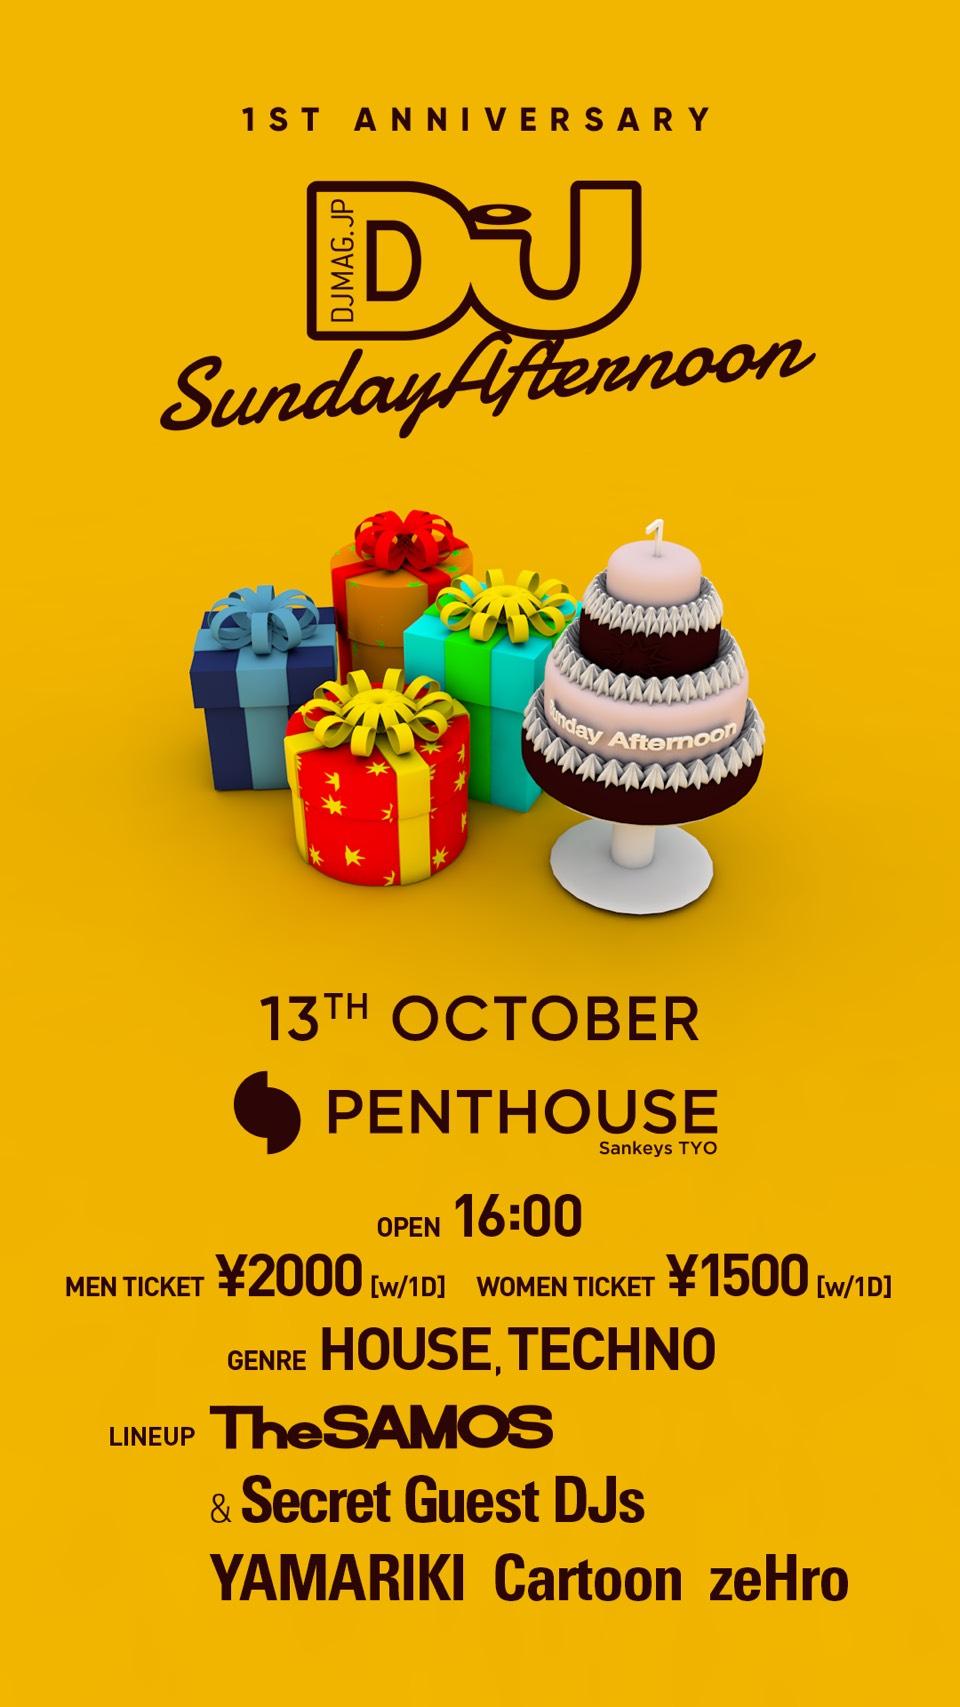 DJ MAG Sunday Afternoon 1ST ANNIVERSARY